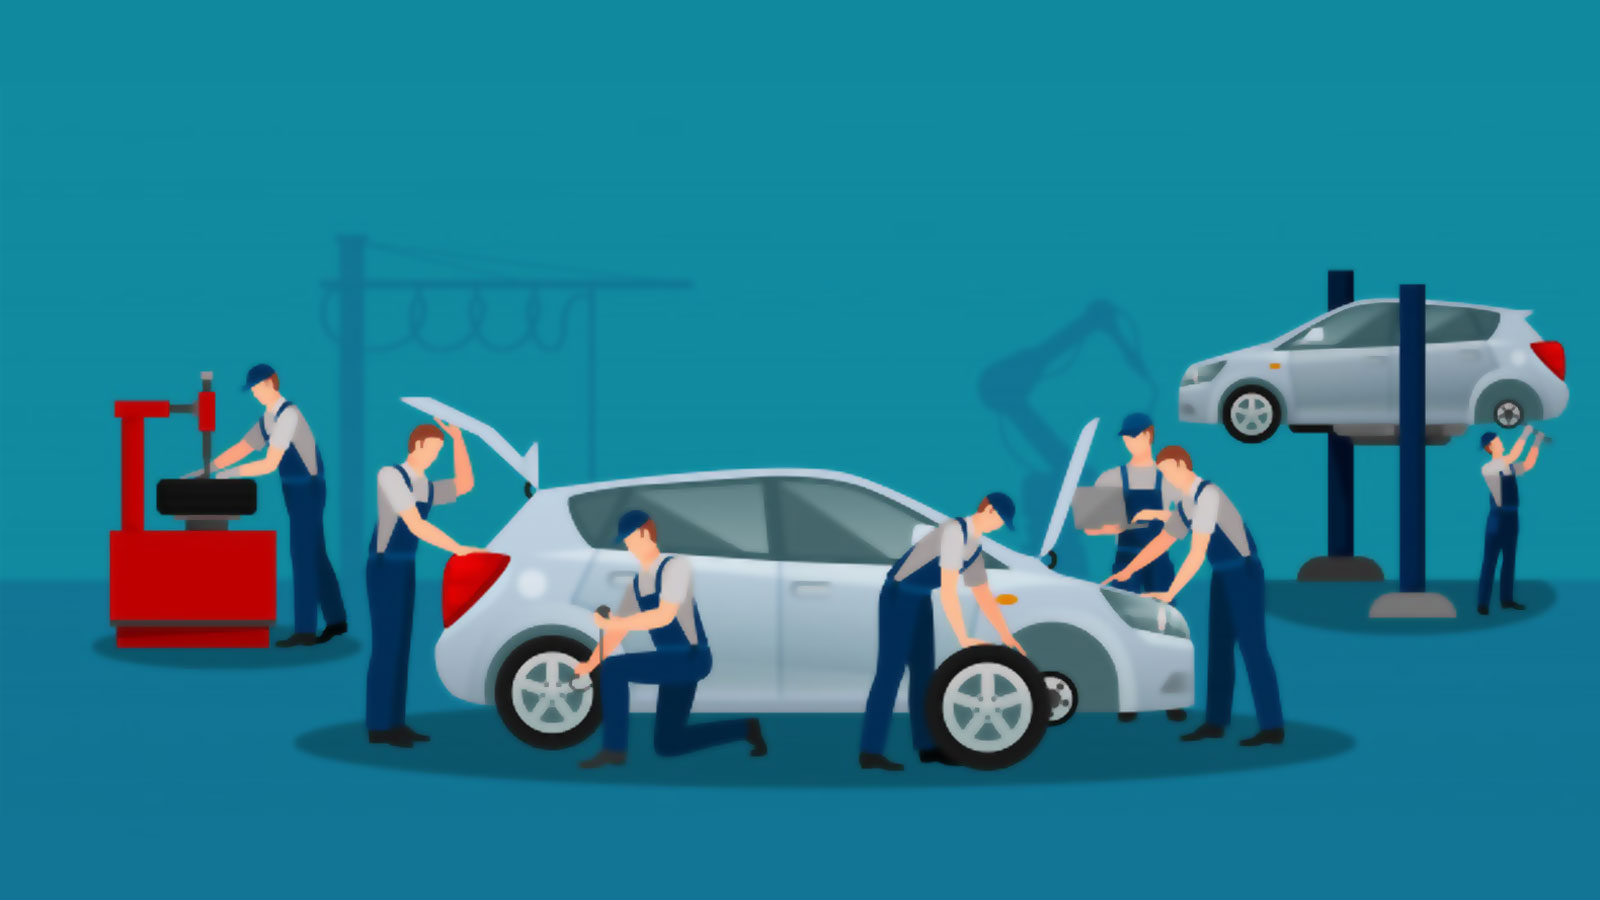 To service του αυτοκινήτου σας αποτελεί μία αναγκαία διαδικασία που θα πρέπει να εκτελείται από ένα έμπειρο και αξιόπιστο συνεργέιο